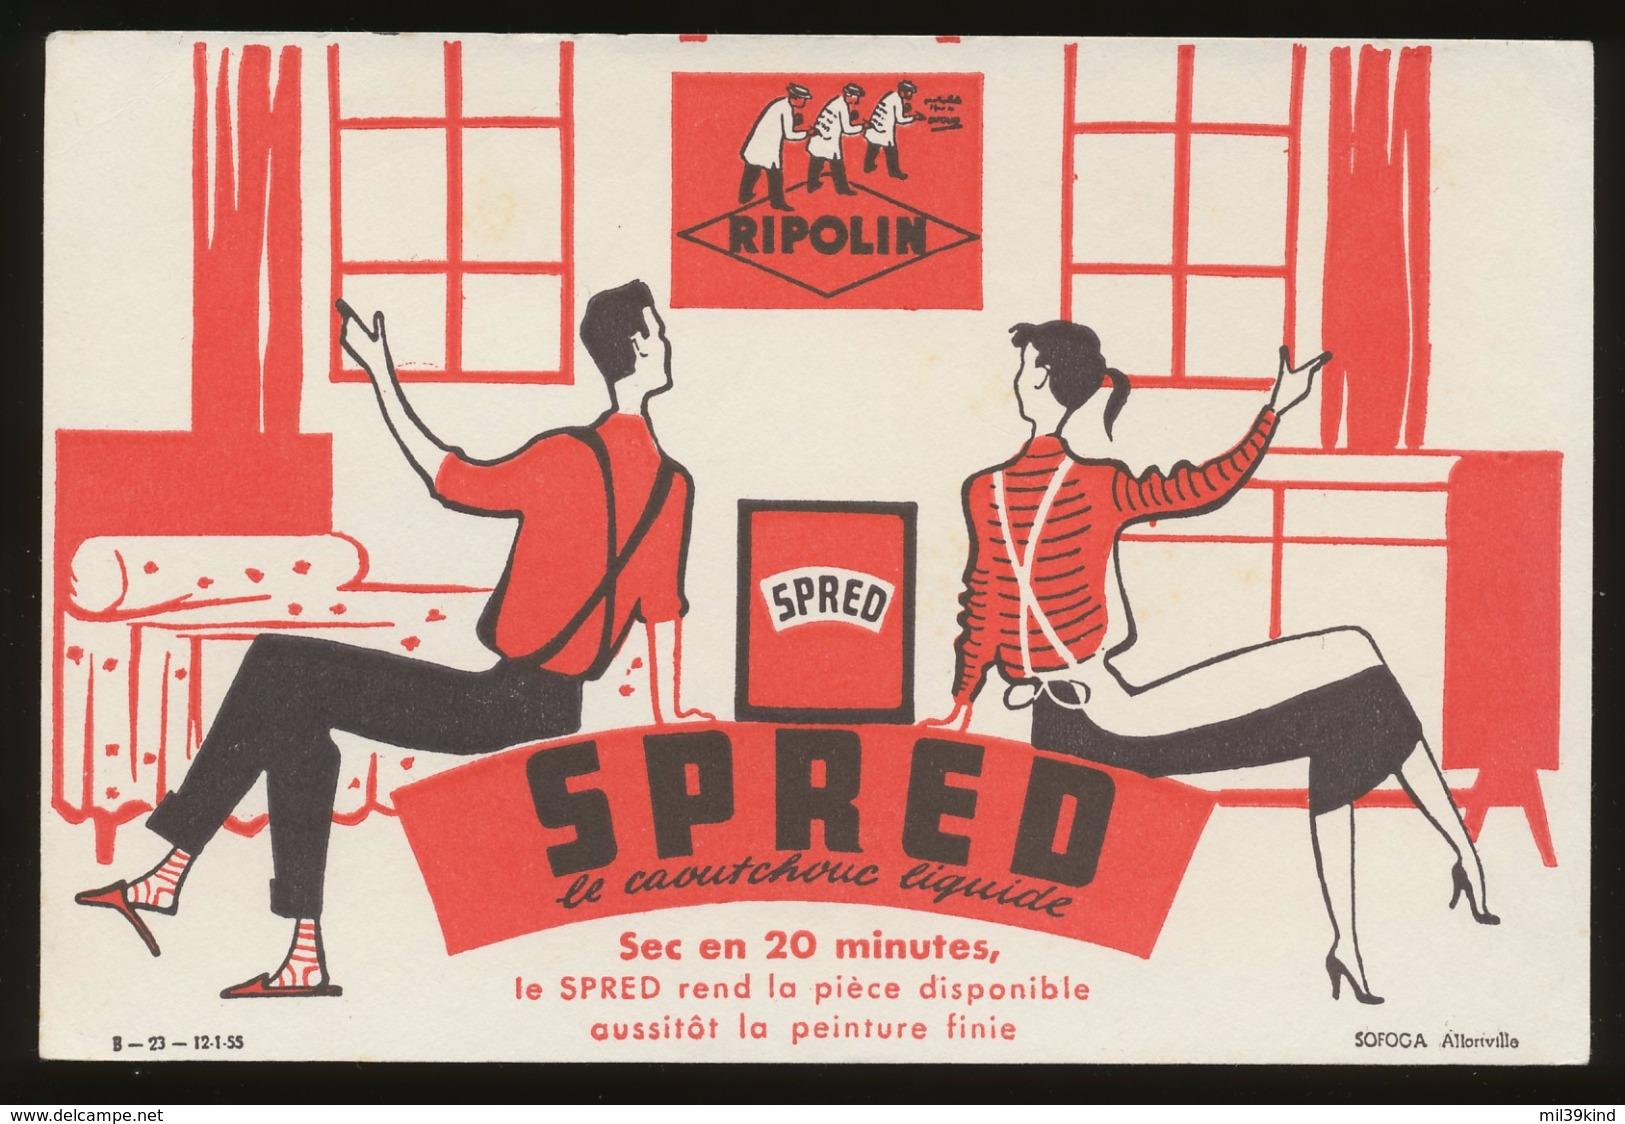 Buvard - PEINTURE SPRED LE CAOUTCHOUC LIQUIDE - Produit Ripolin - S